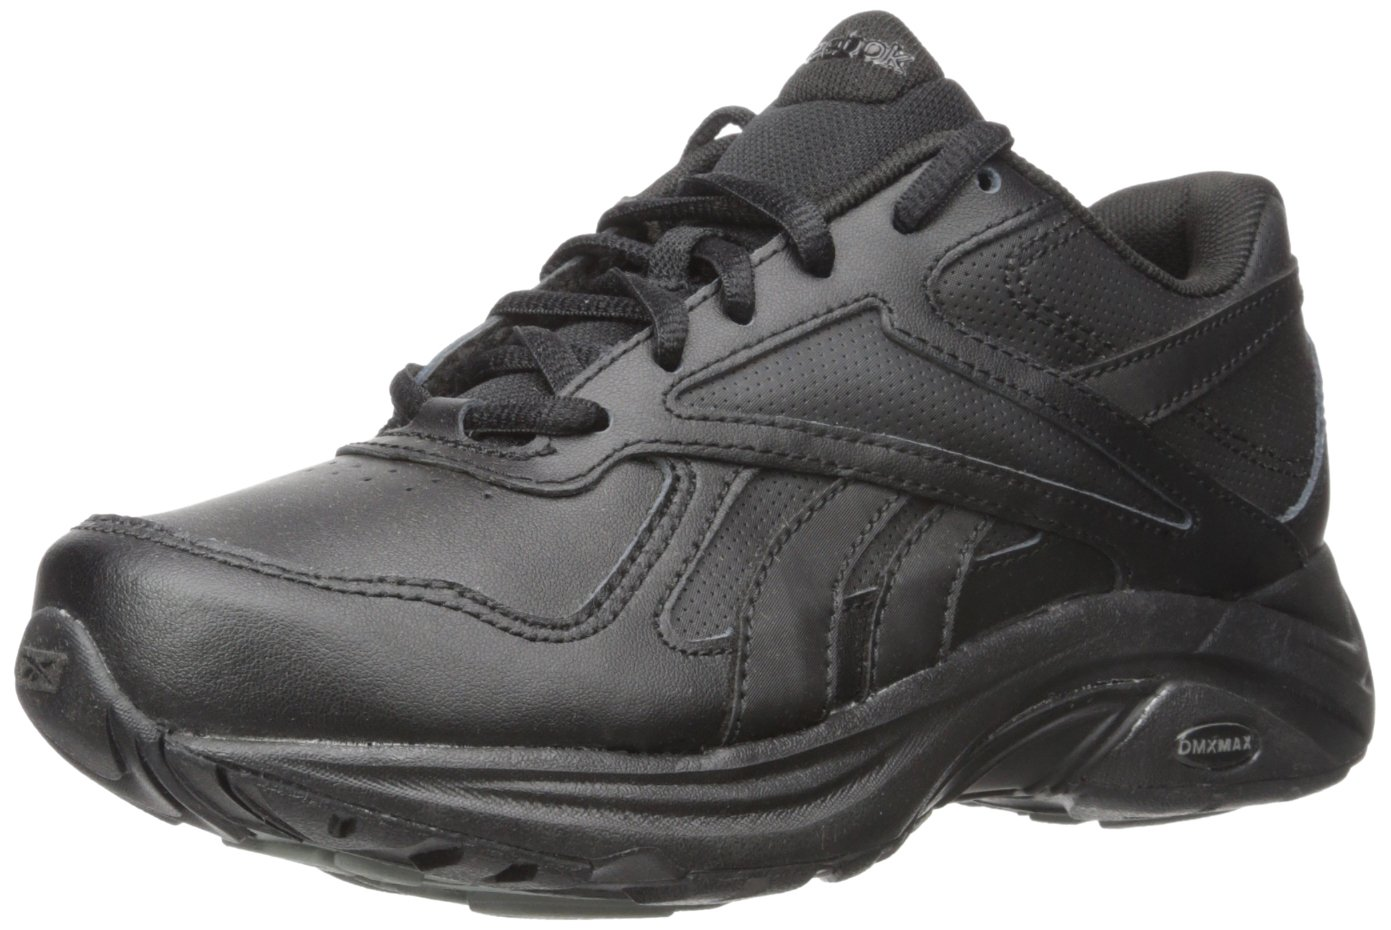 Reebok Women's Ultra V B01HH8NVP8 DMX Max Walking Shoe B01HH8NVP8 V 11 B(M) US|Black/Flat Grey ce386a